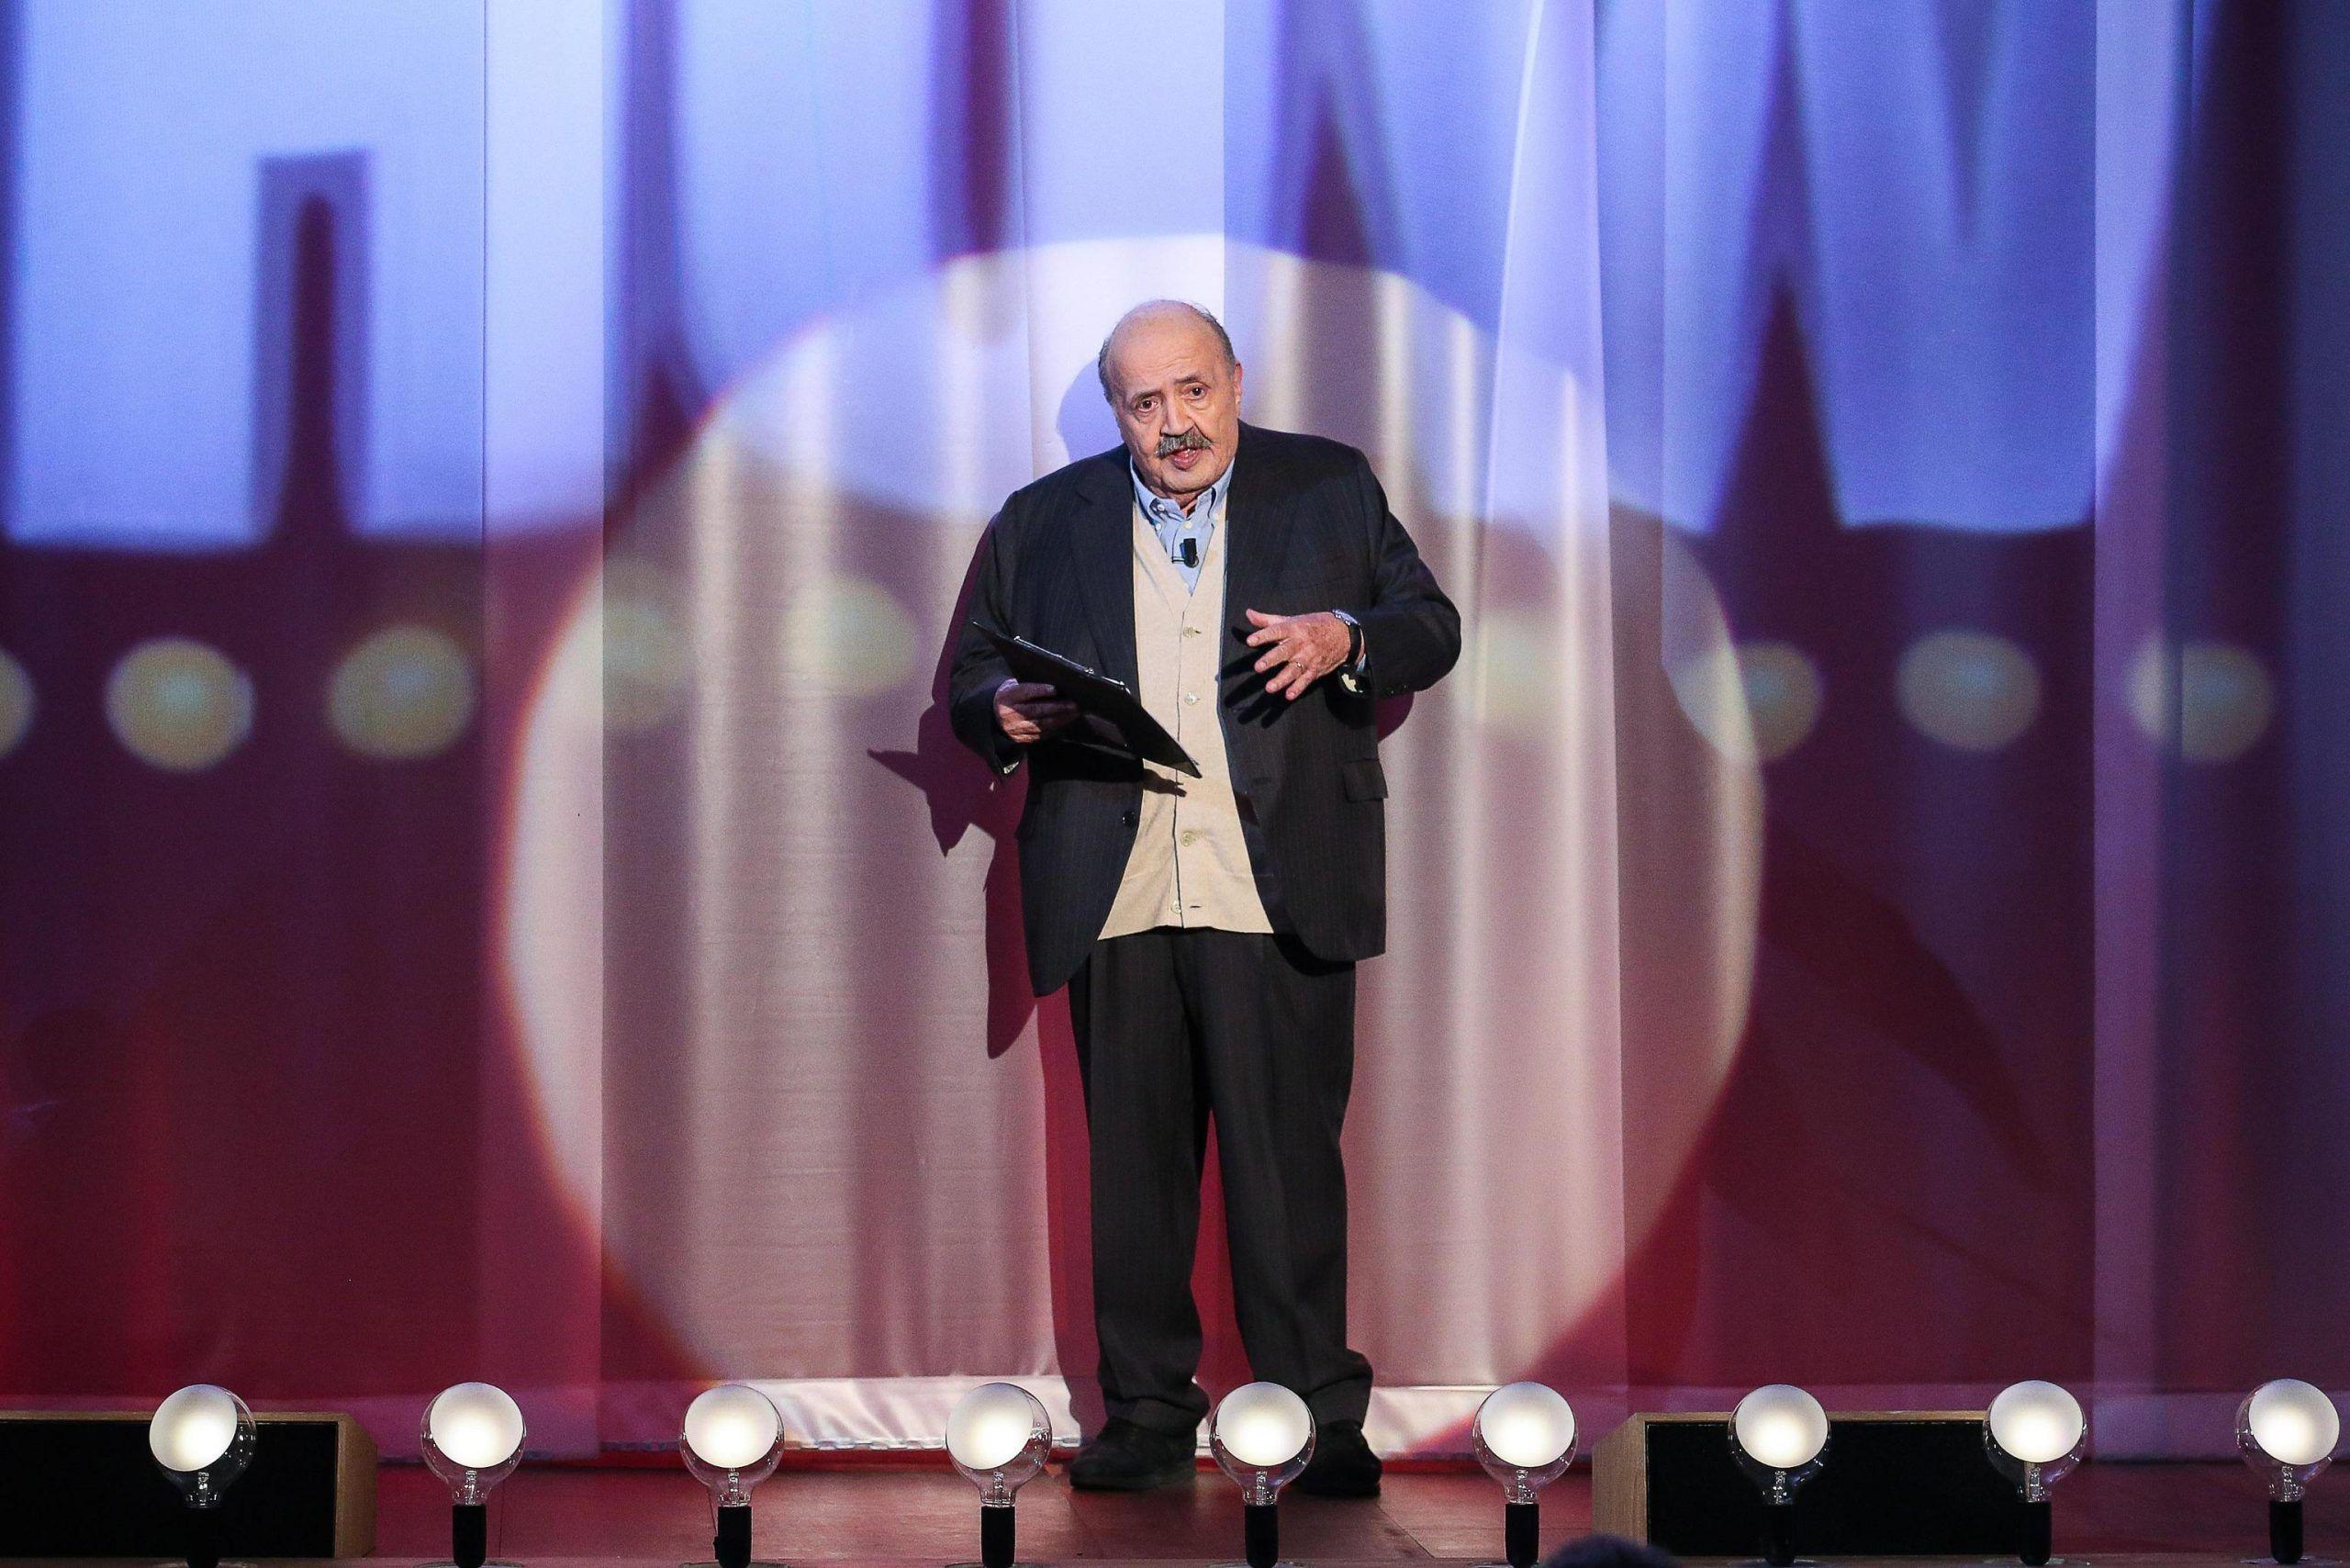 TV: FABRIZIO CORONA, ONE MAN SHOW DA COSTANZO